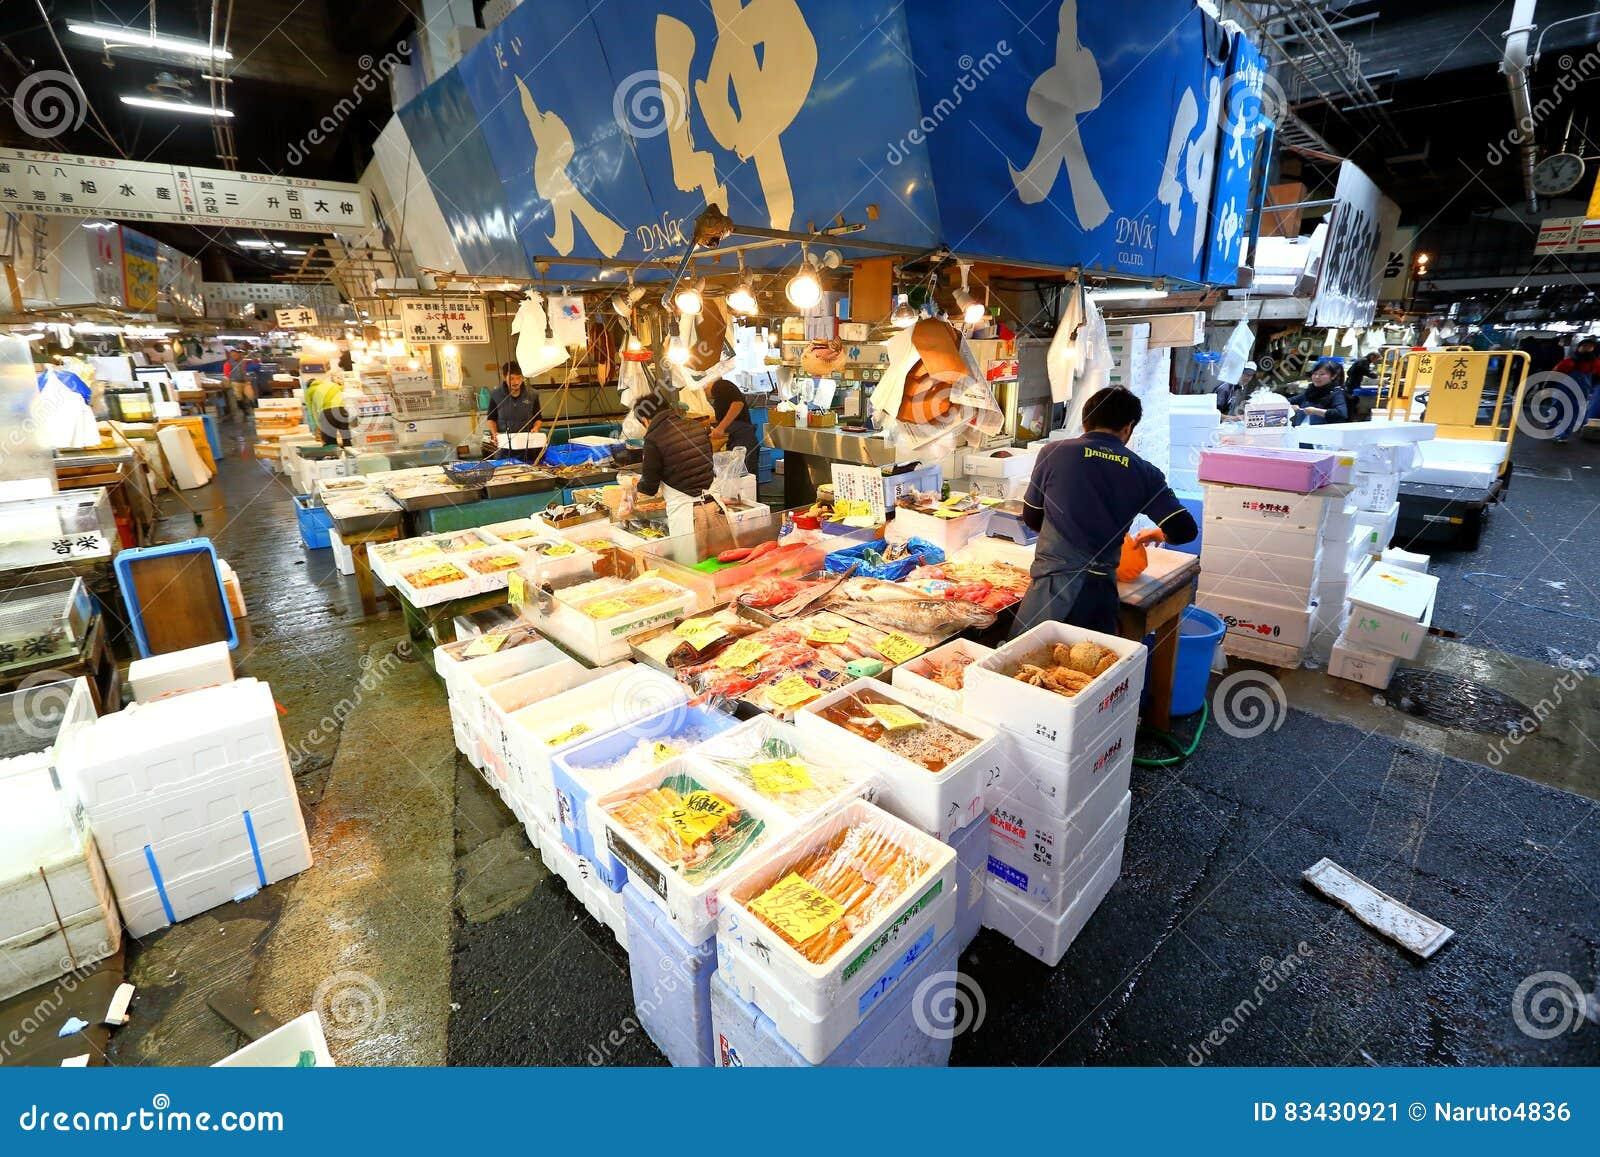 Tokyo tsukiji seafood fish market editorial photo image for Wholesale fish market